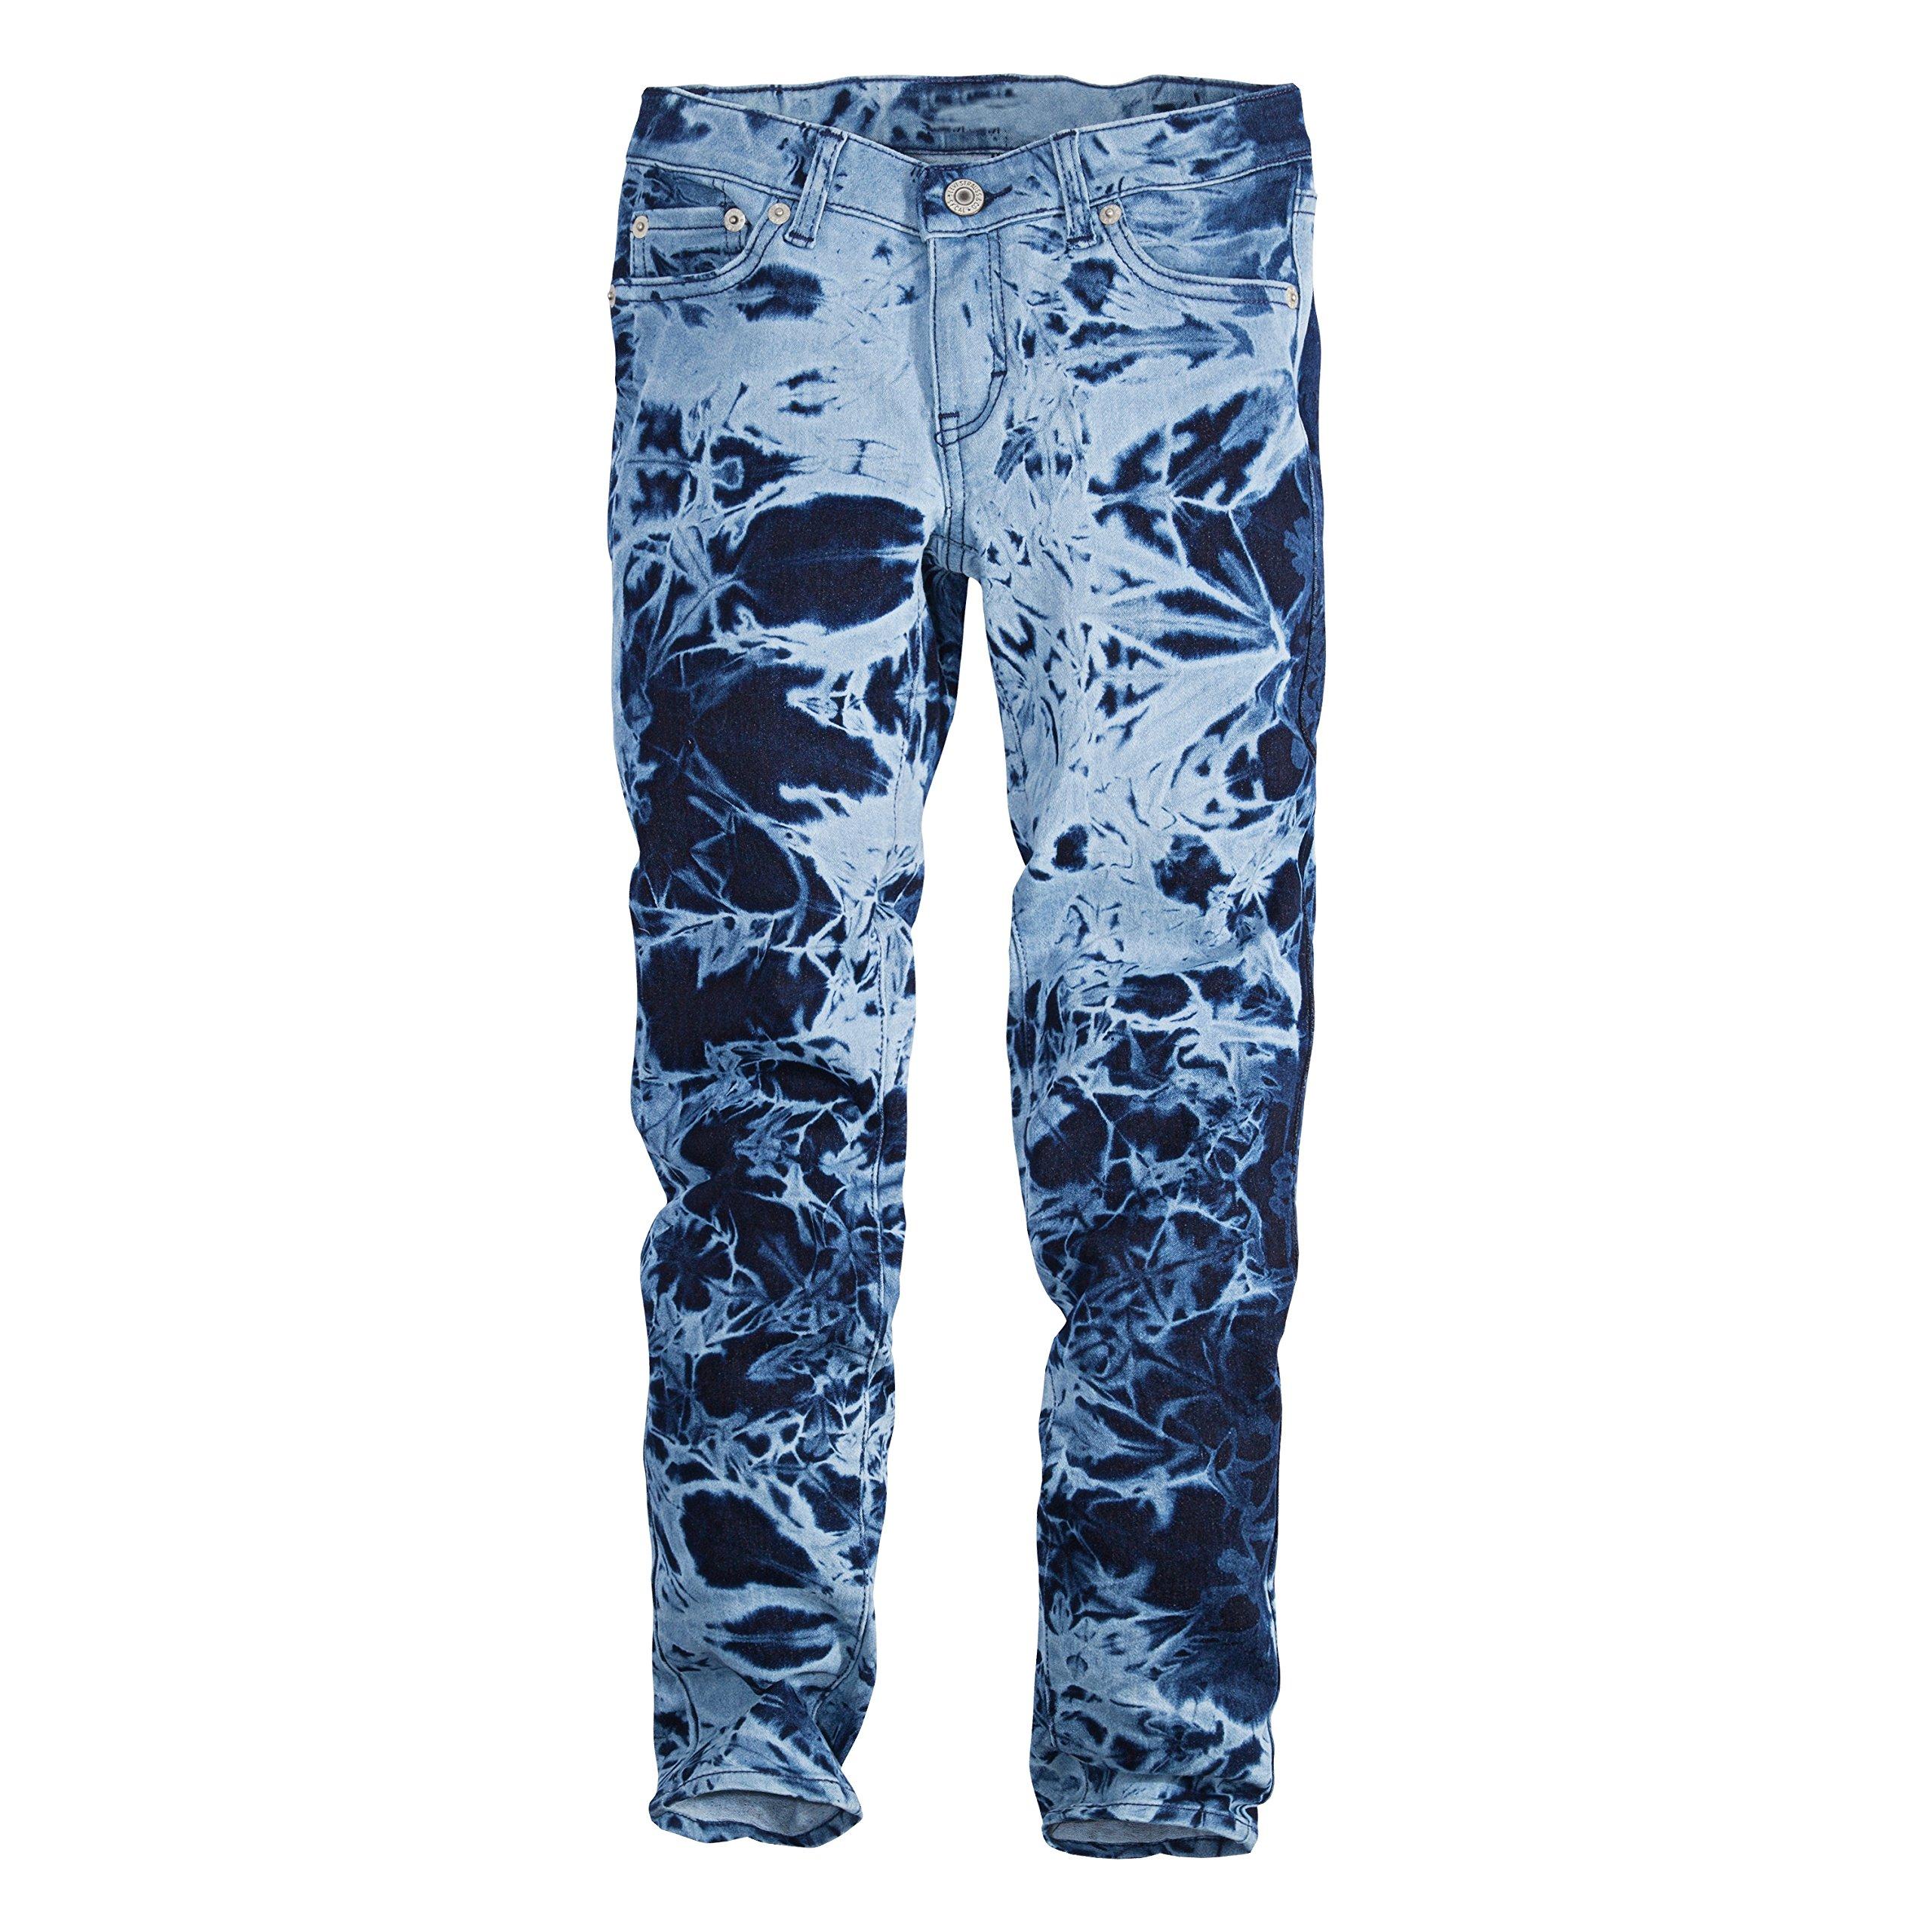 Levi's Girls' Big 710 Super Skinny Fit Jeans, Latte